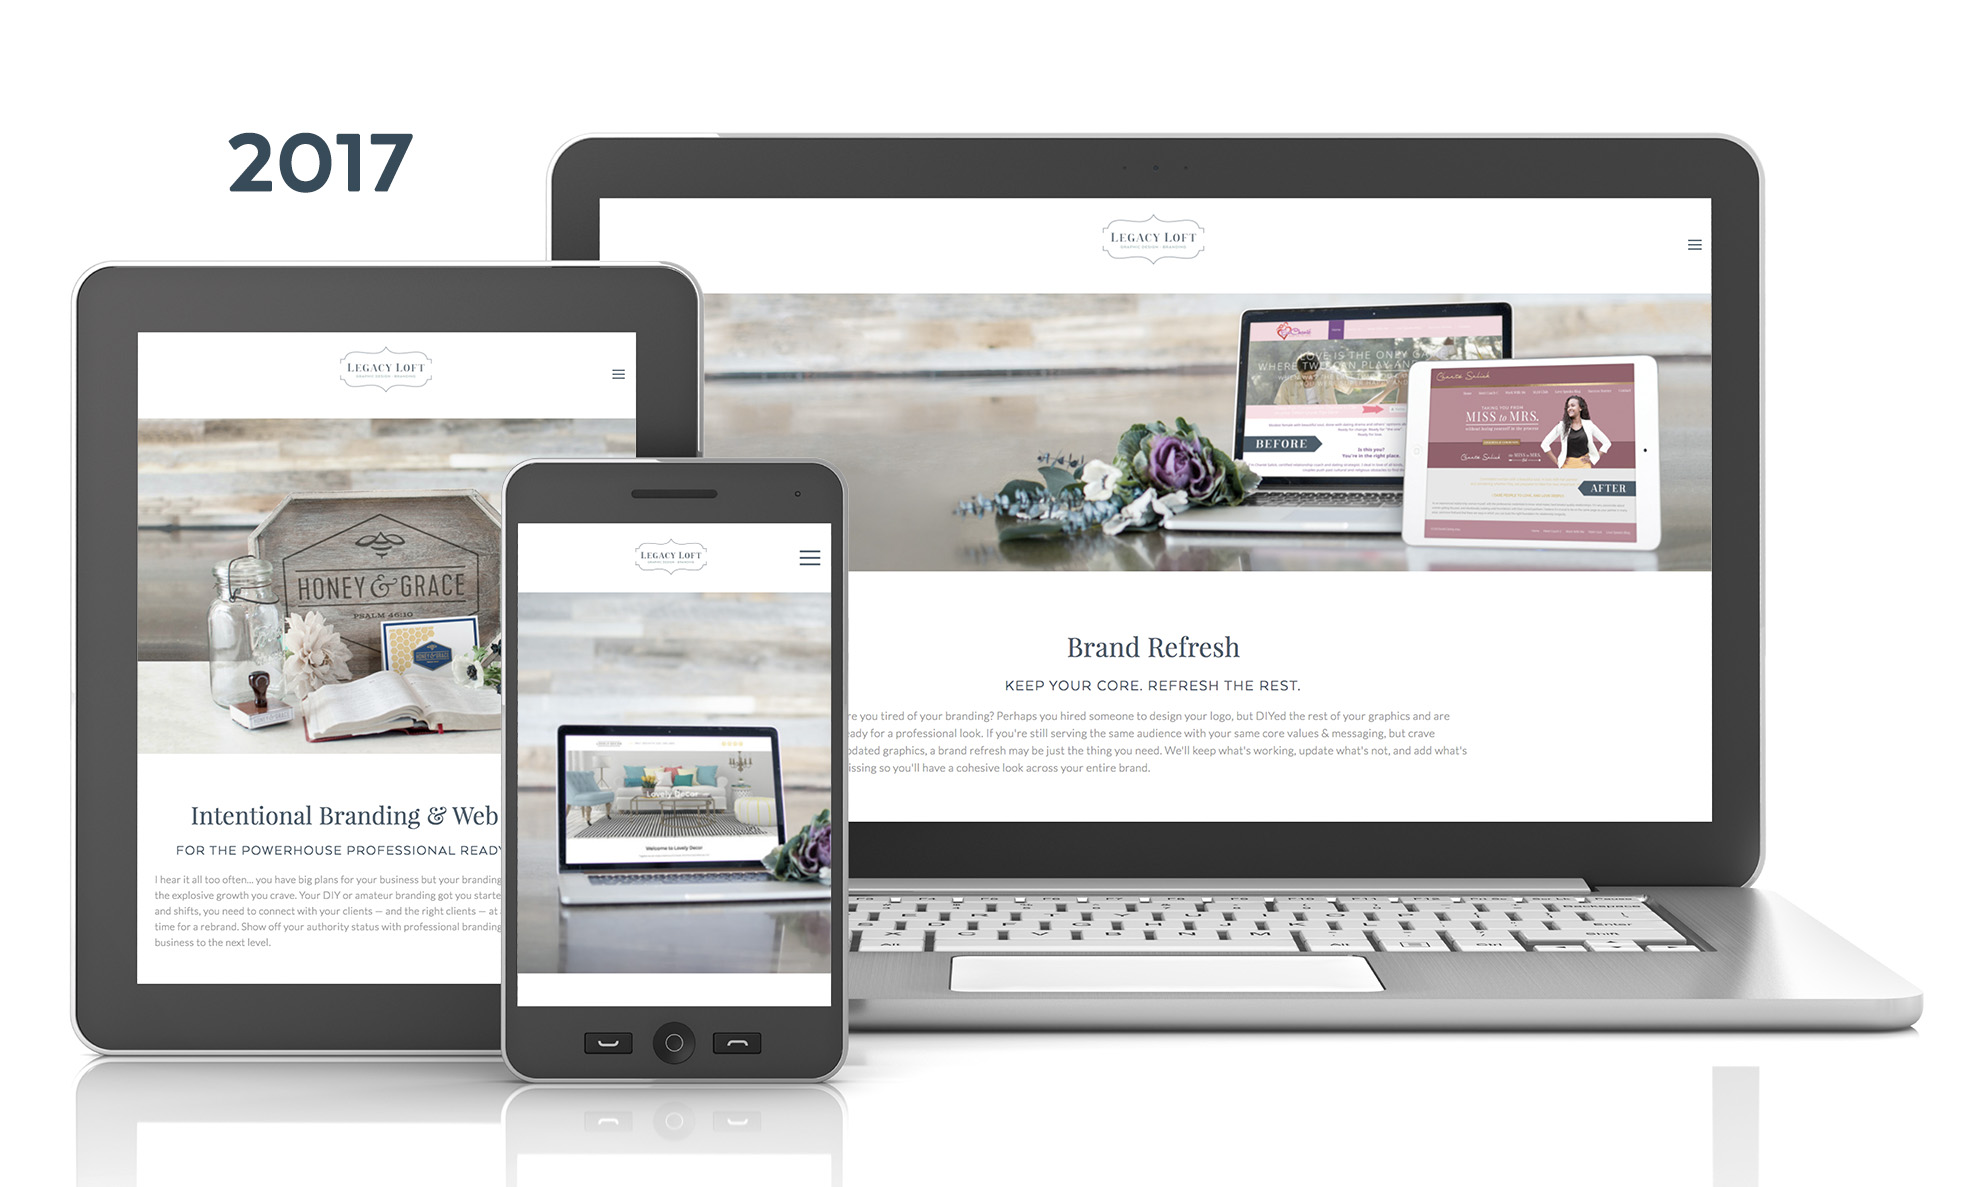 Web-Design-Redesign-2017.jpg